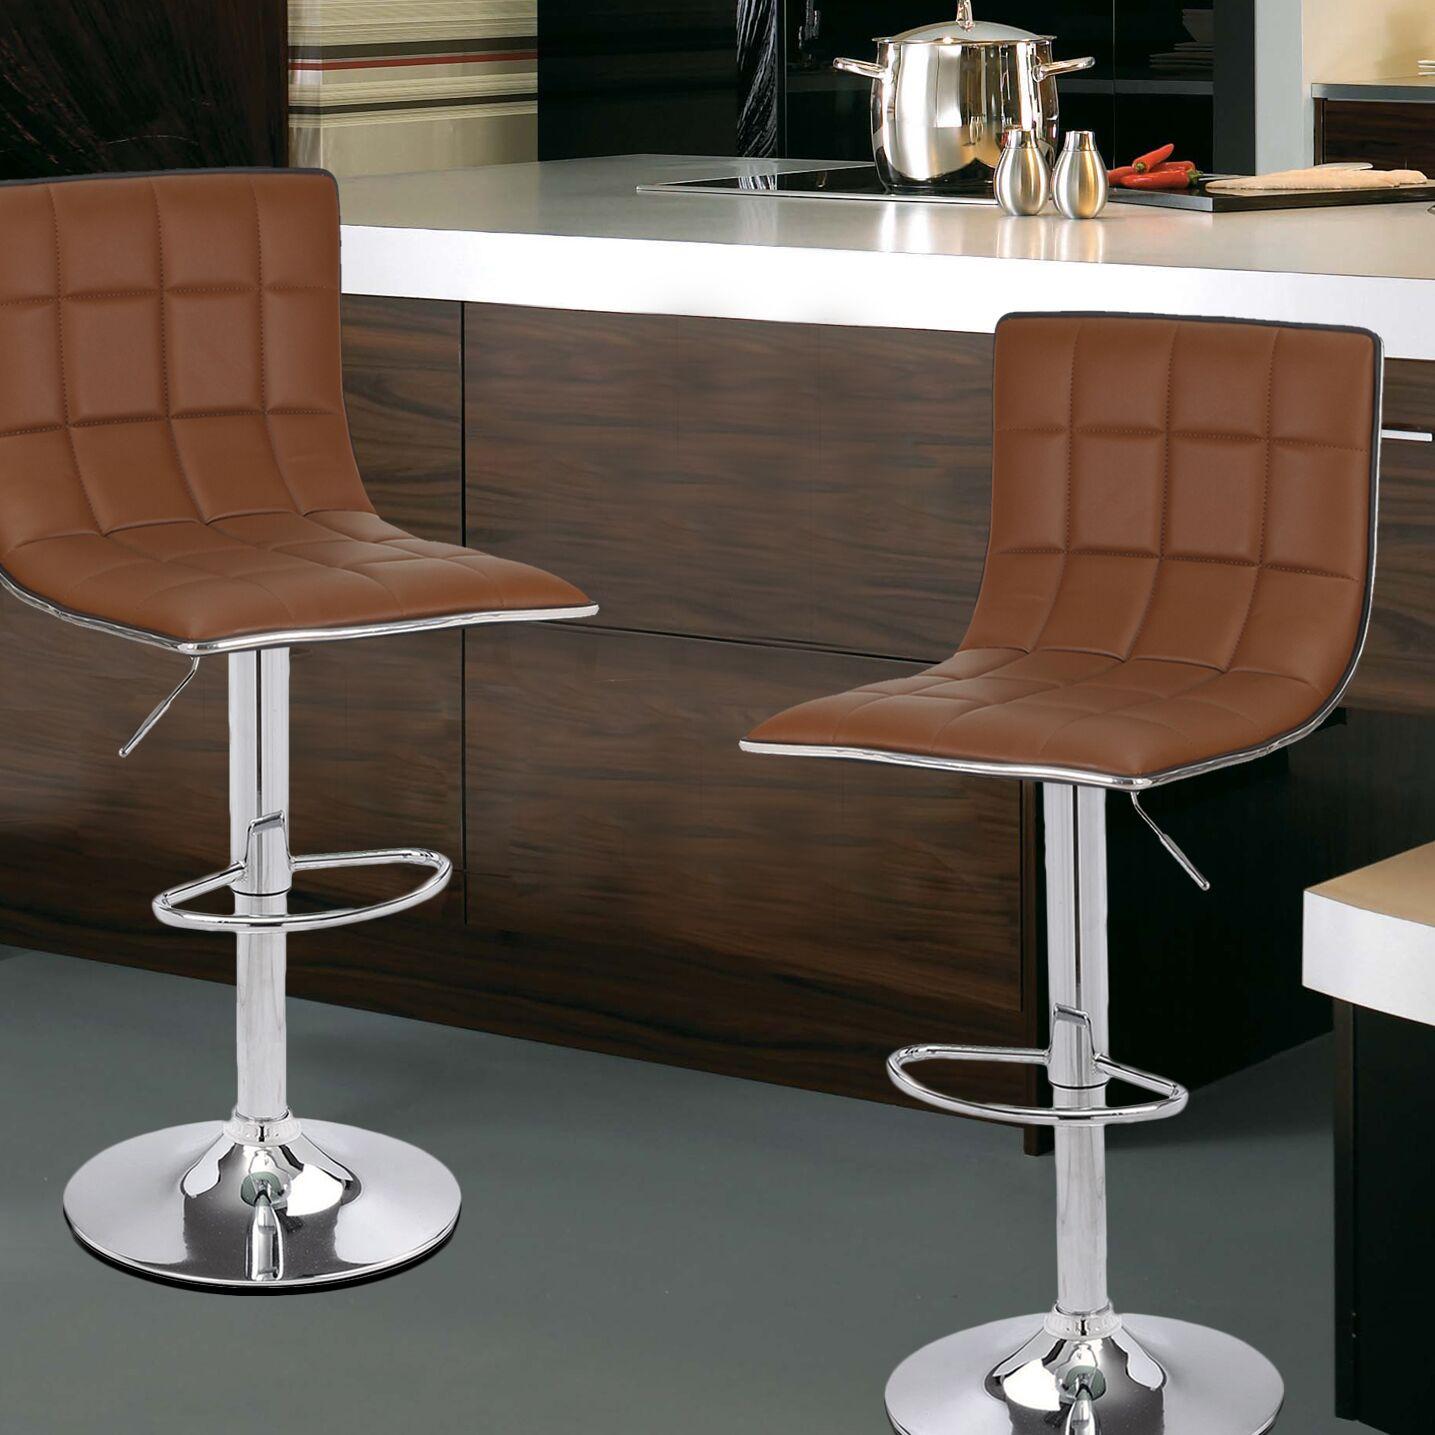 Adjustable Height Swivel Bar Stool Upholstery: Coffee